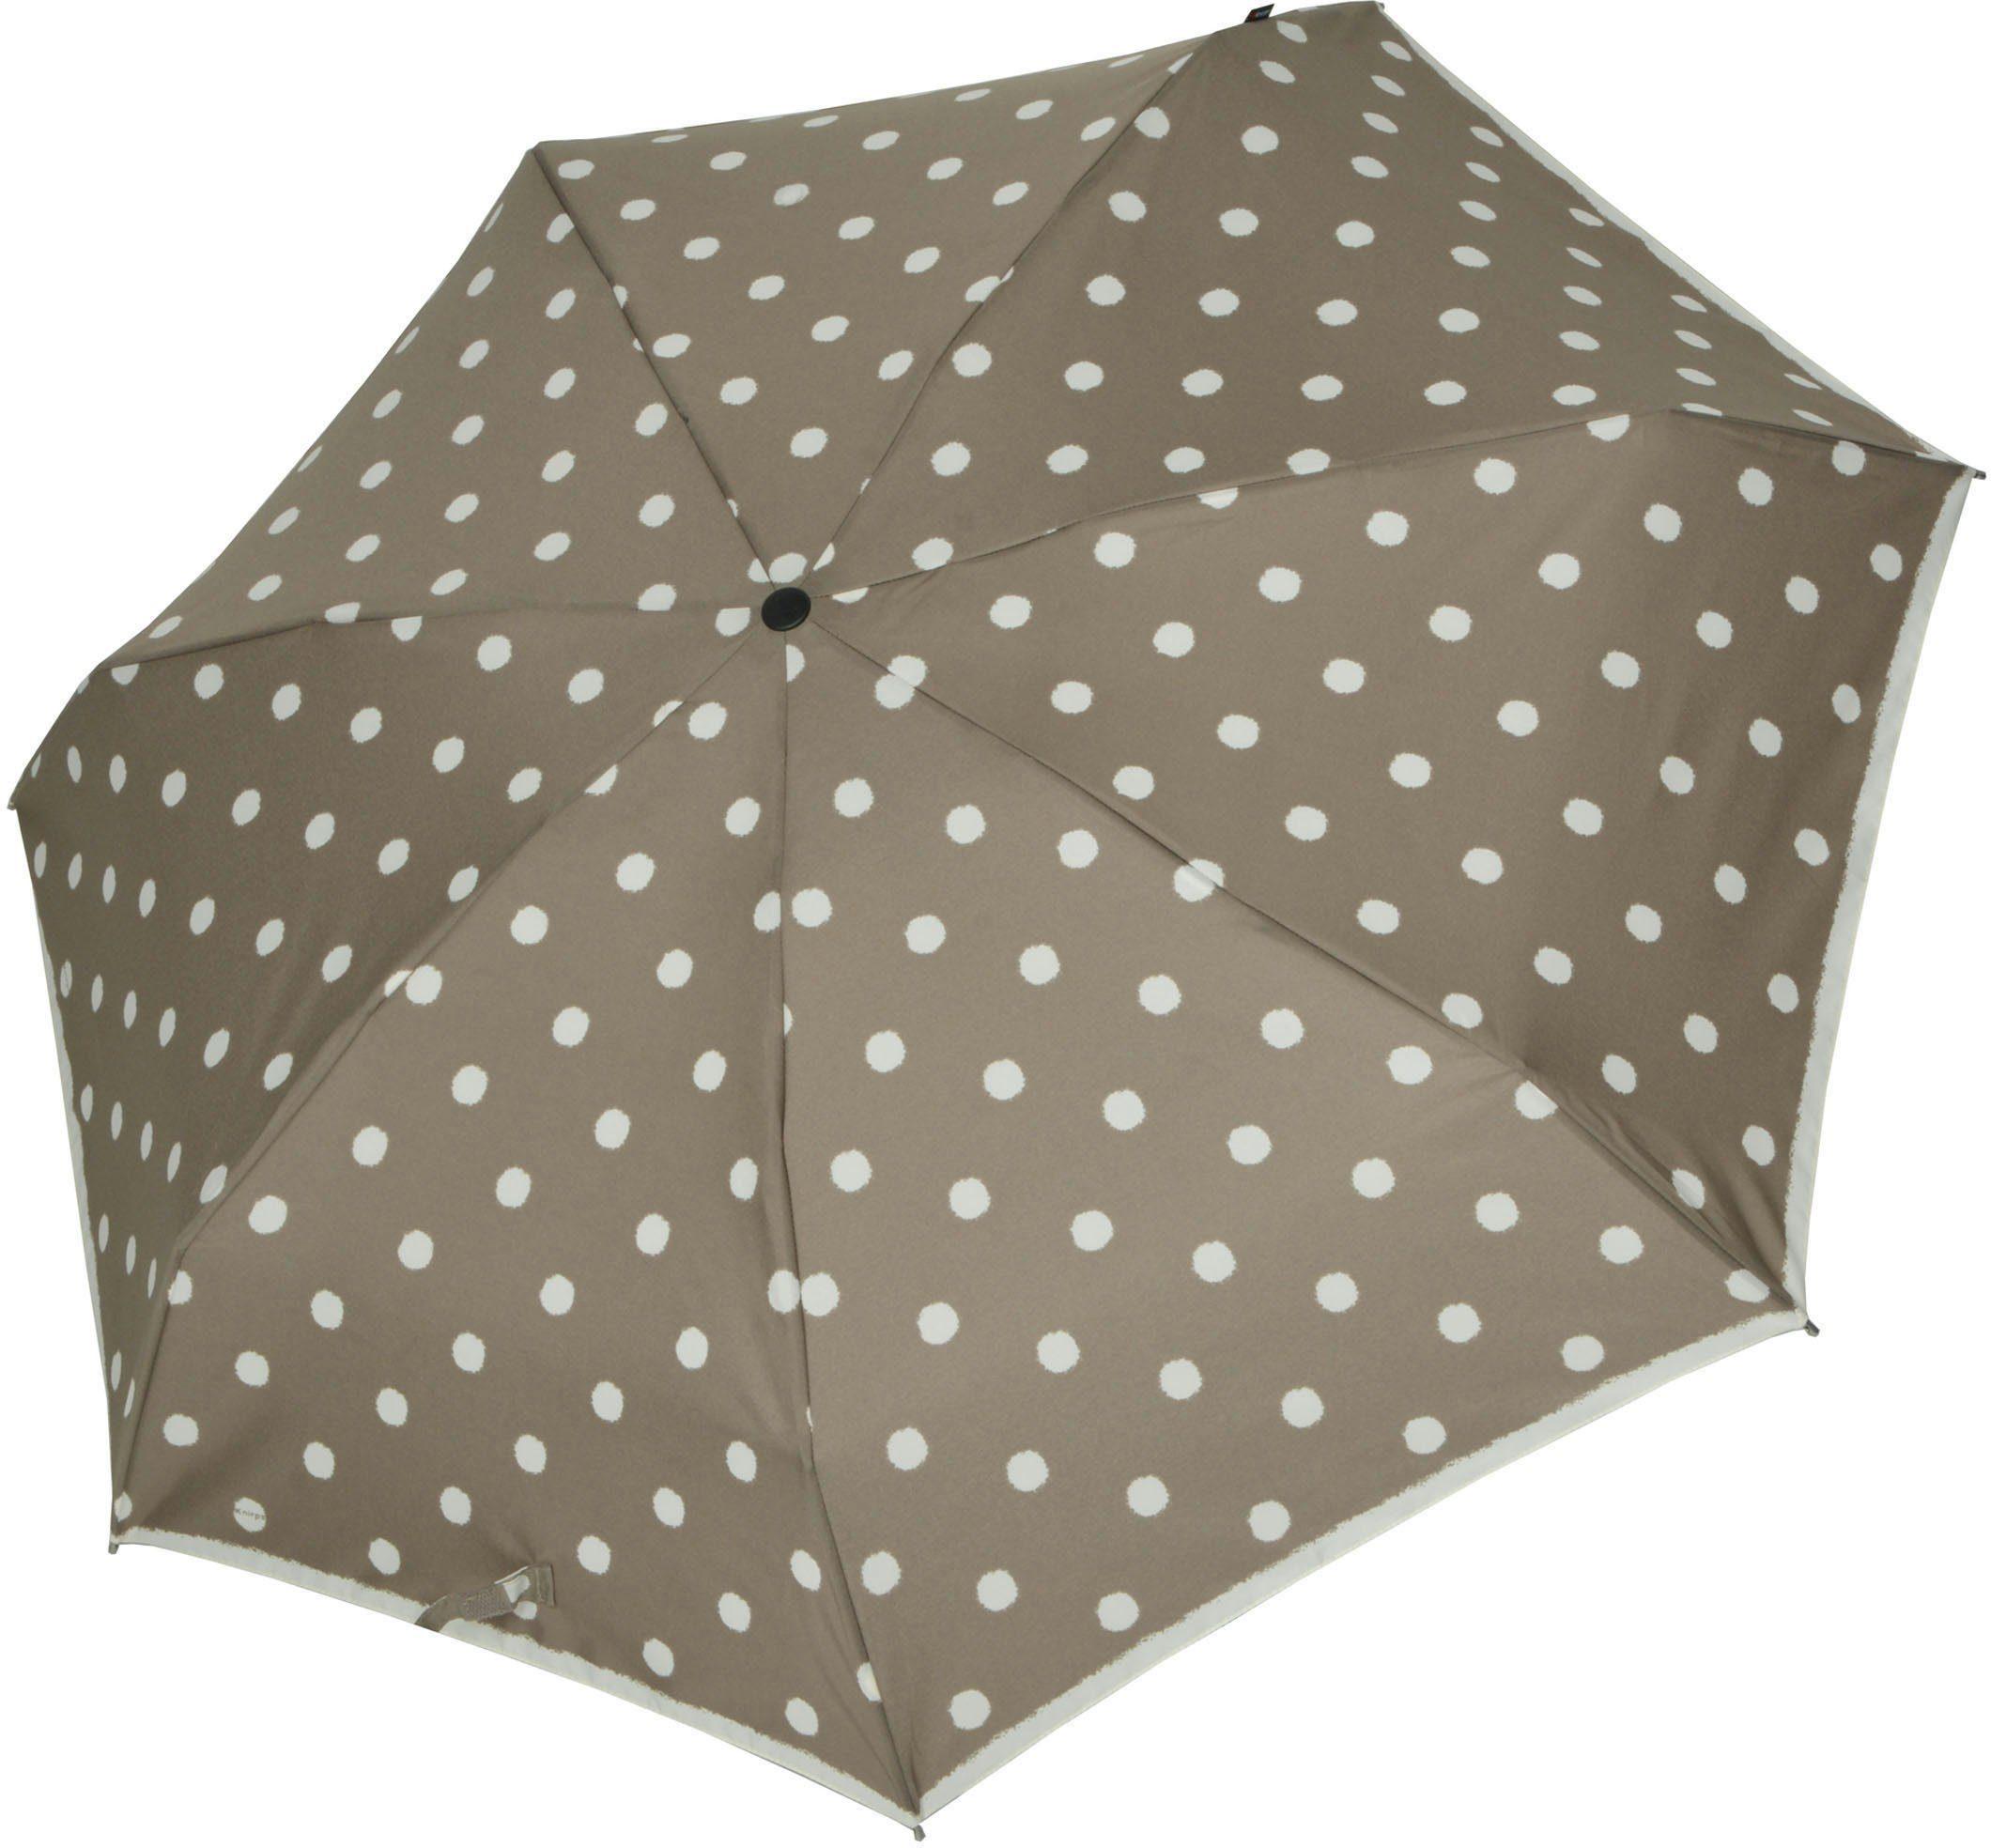 Knirps Regenschirm, »Taschenschirm Piccolo dot art taupe«